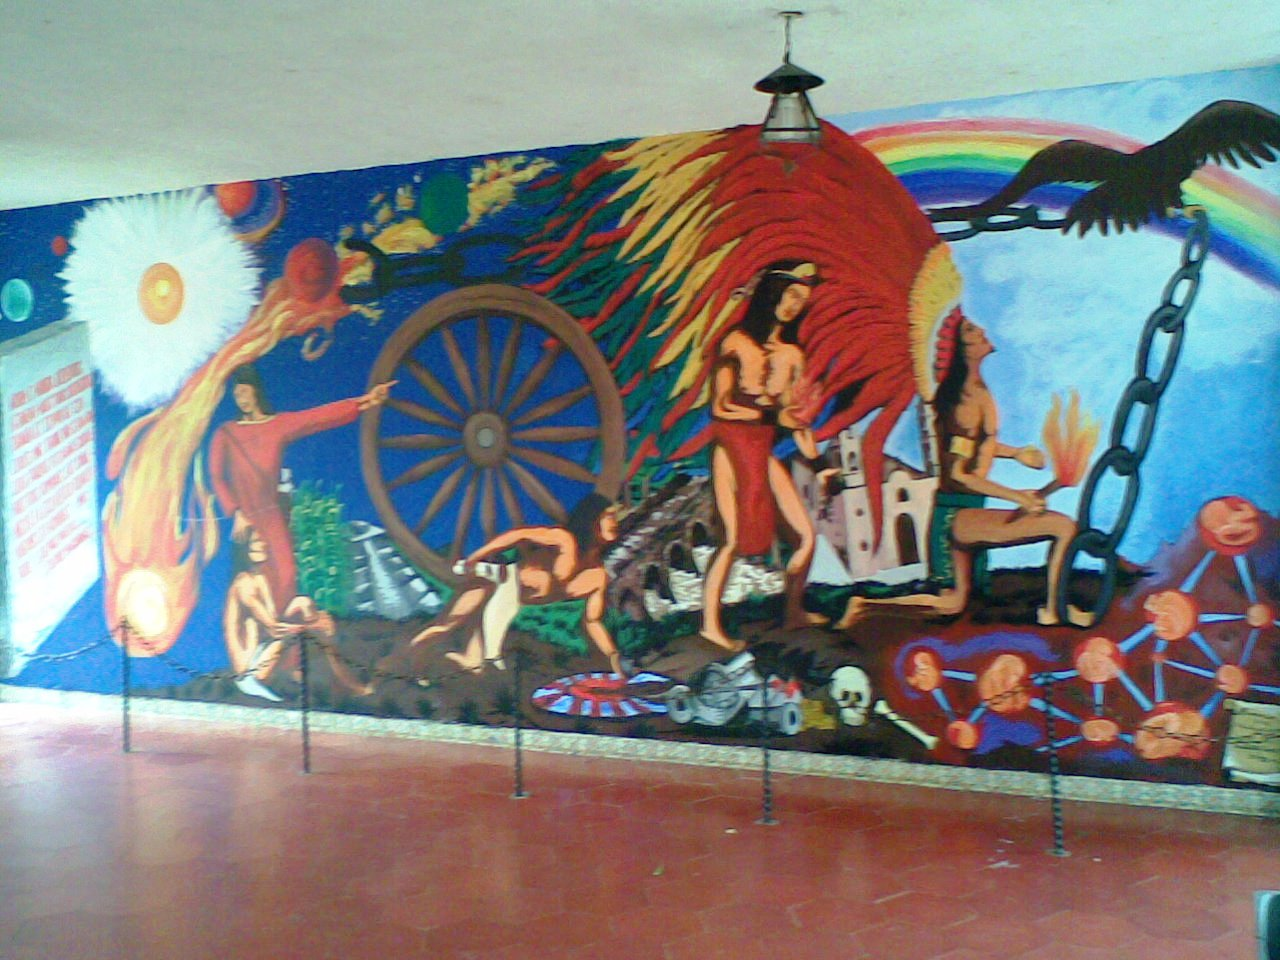 arcadia salvaterrense murales de la preparatoria oficial On mural de prepa 1 toluca